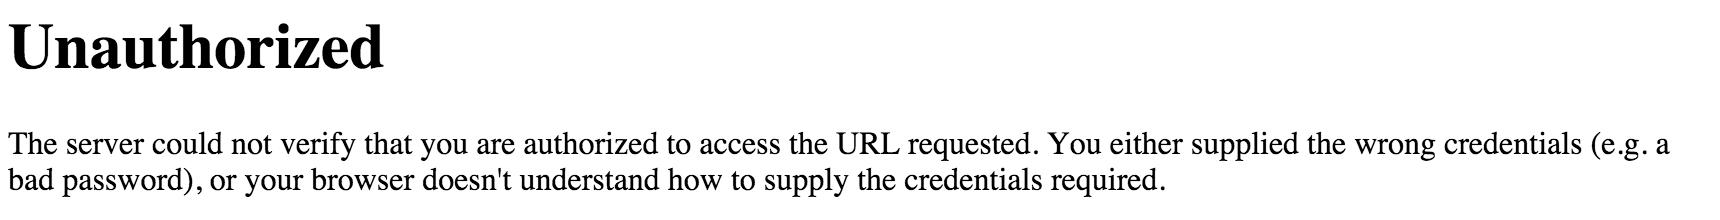 Unauthorized